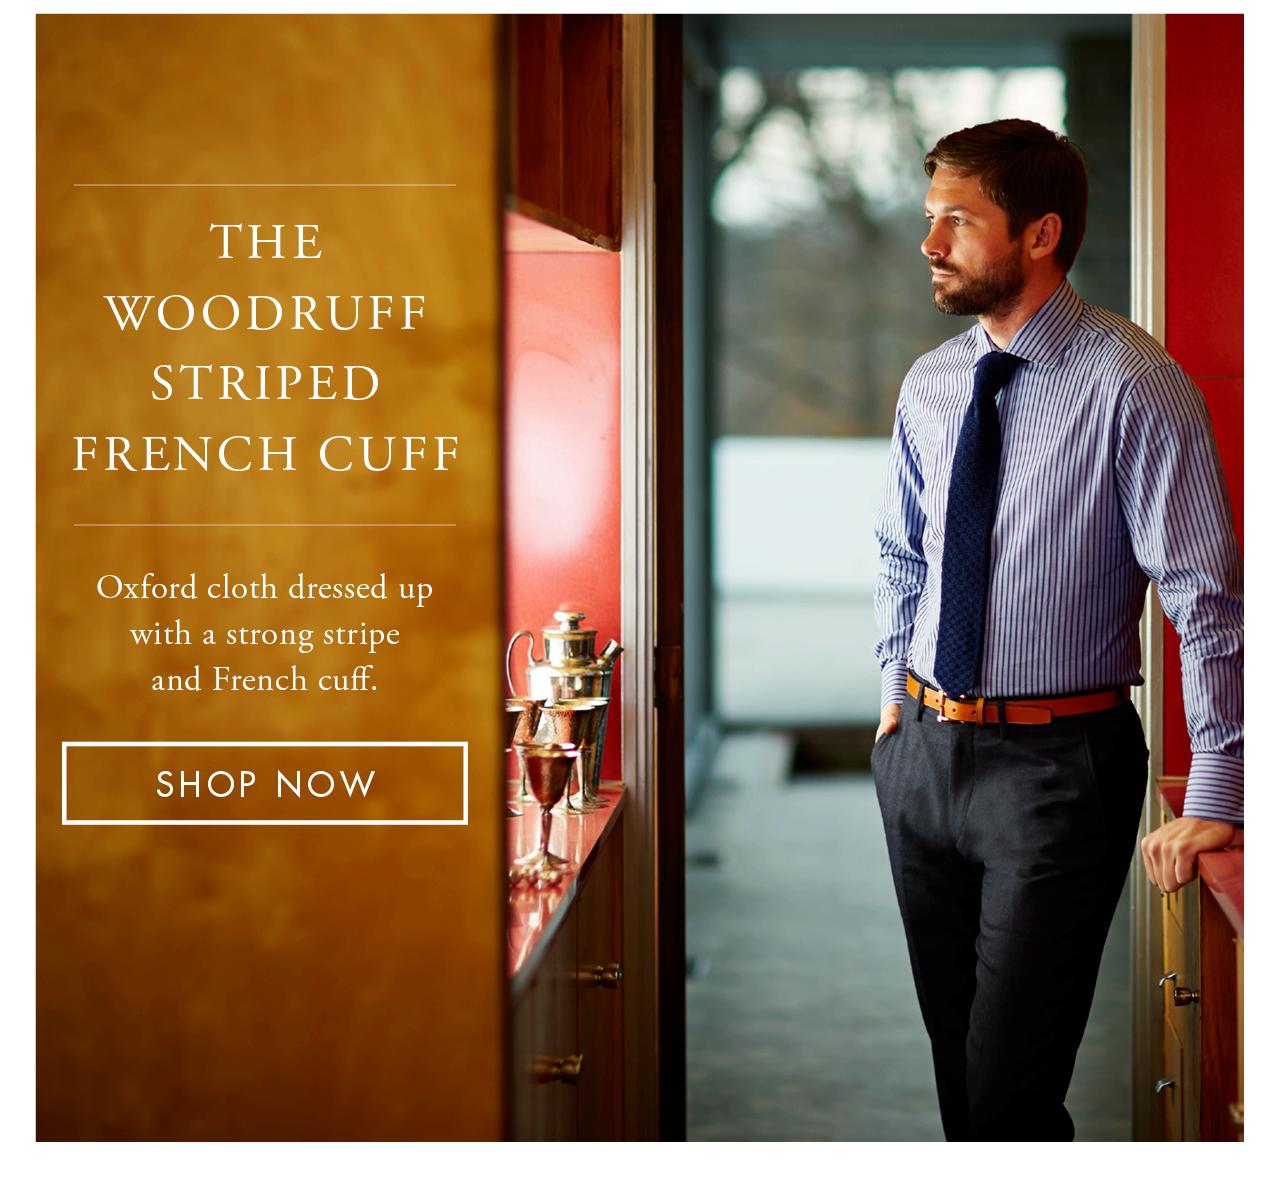 The Woodruff Striped French Cuff